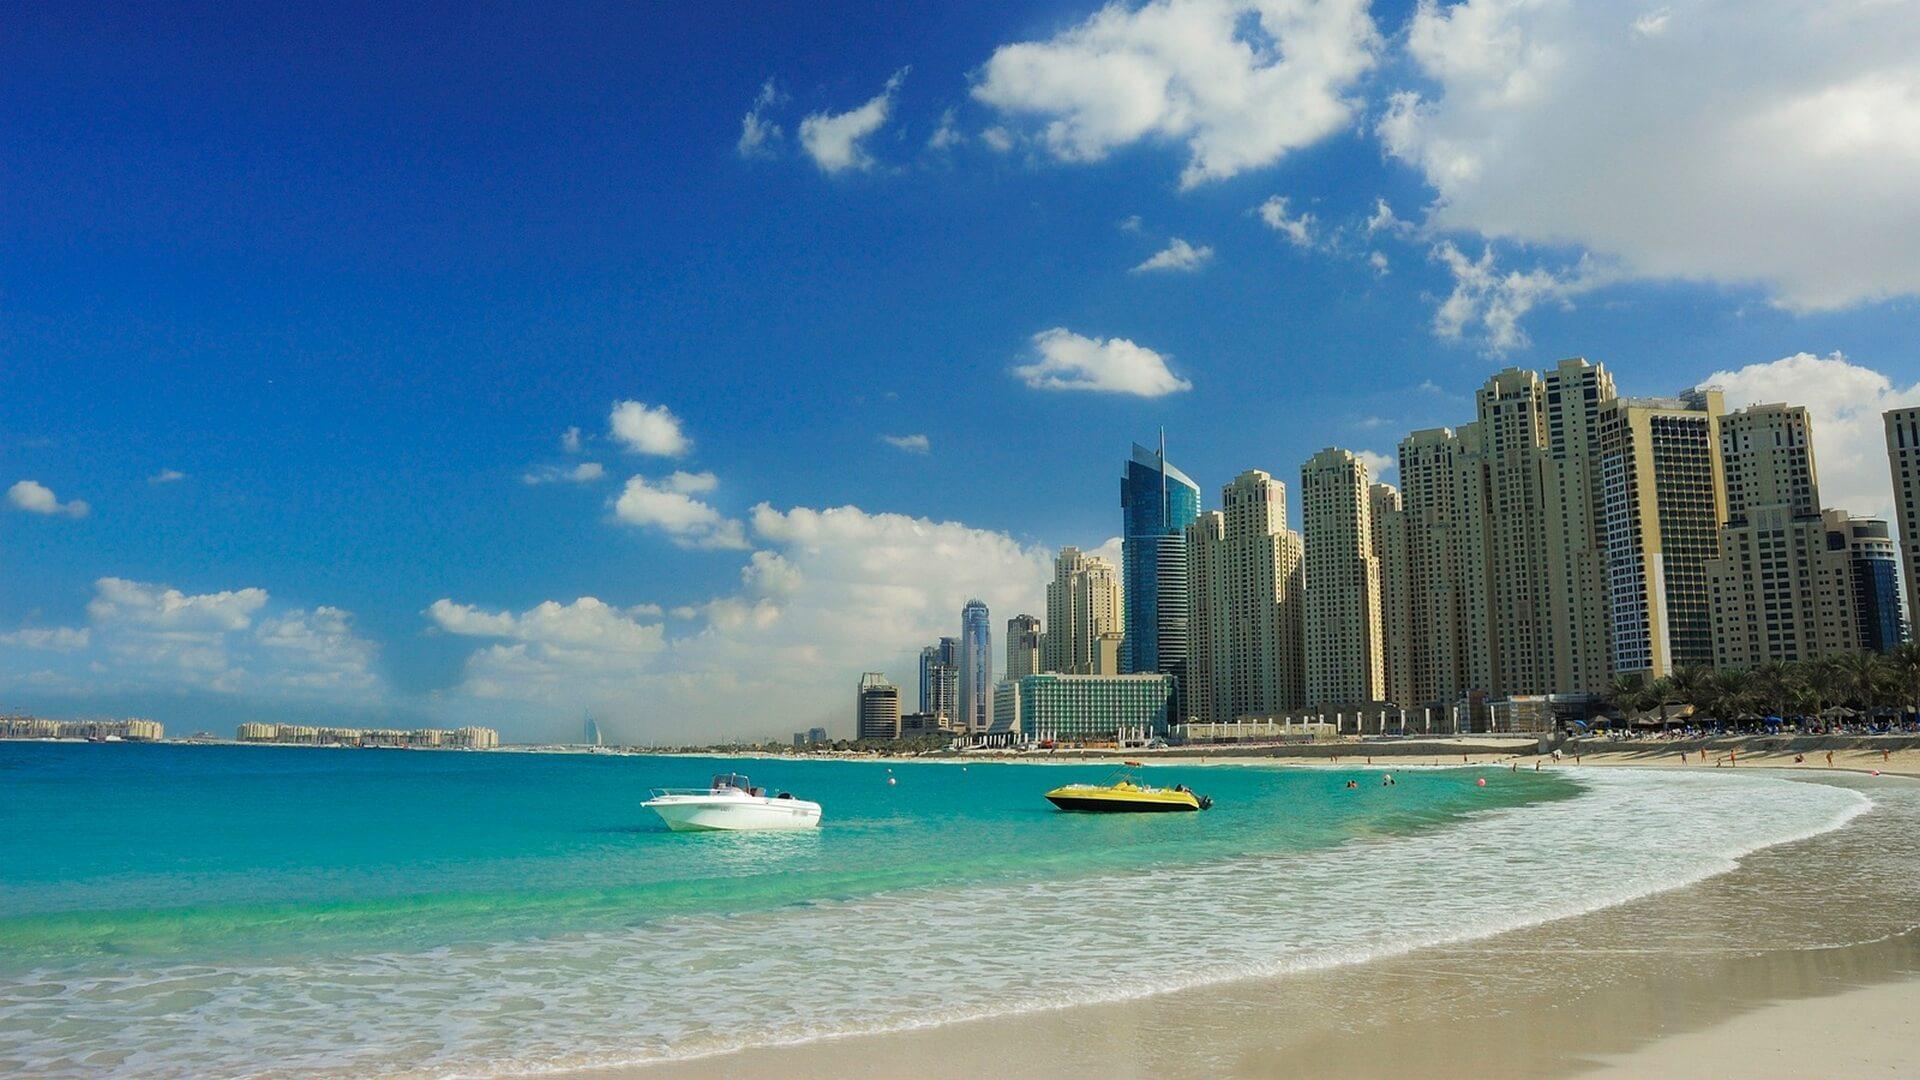 Jumeirah Beach Residence - 3